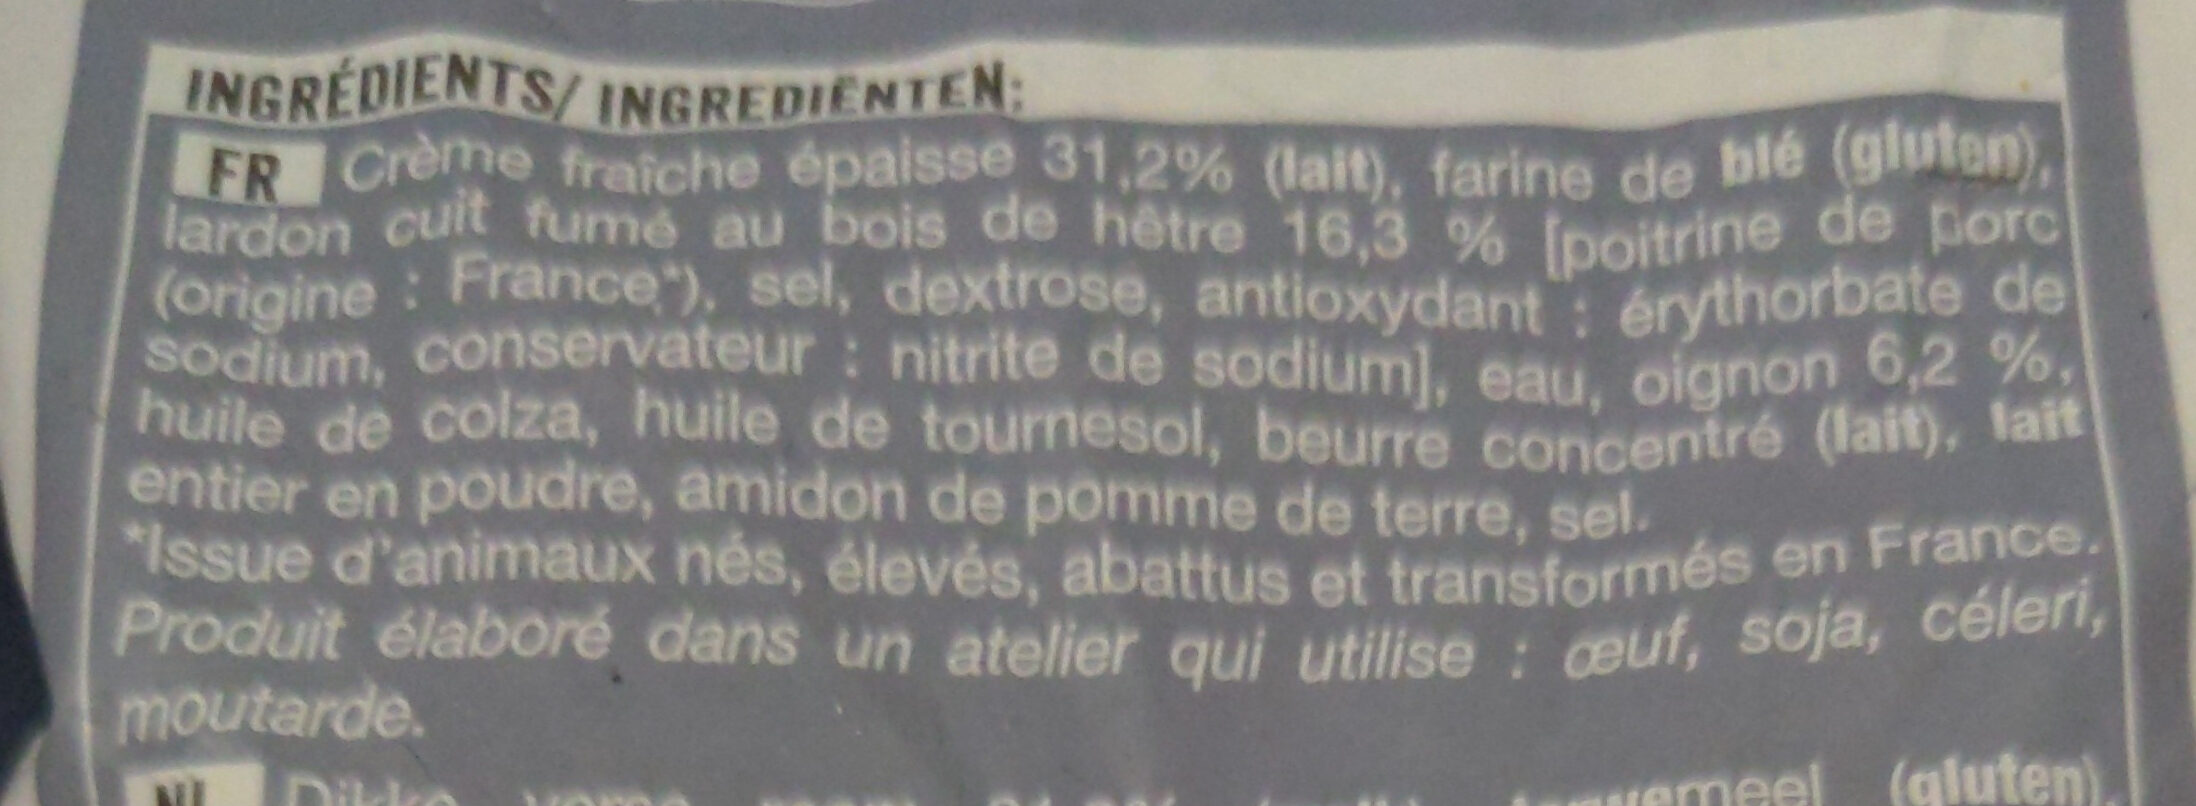 12 mini flammekueches - Ingrediënten - fr